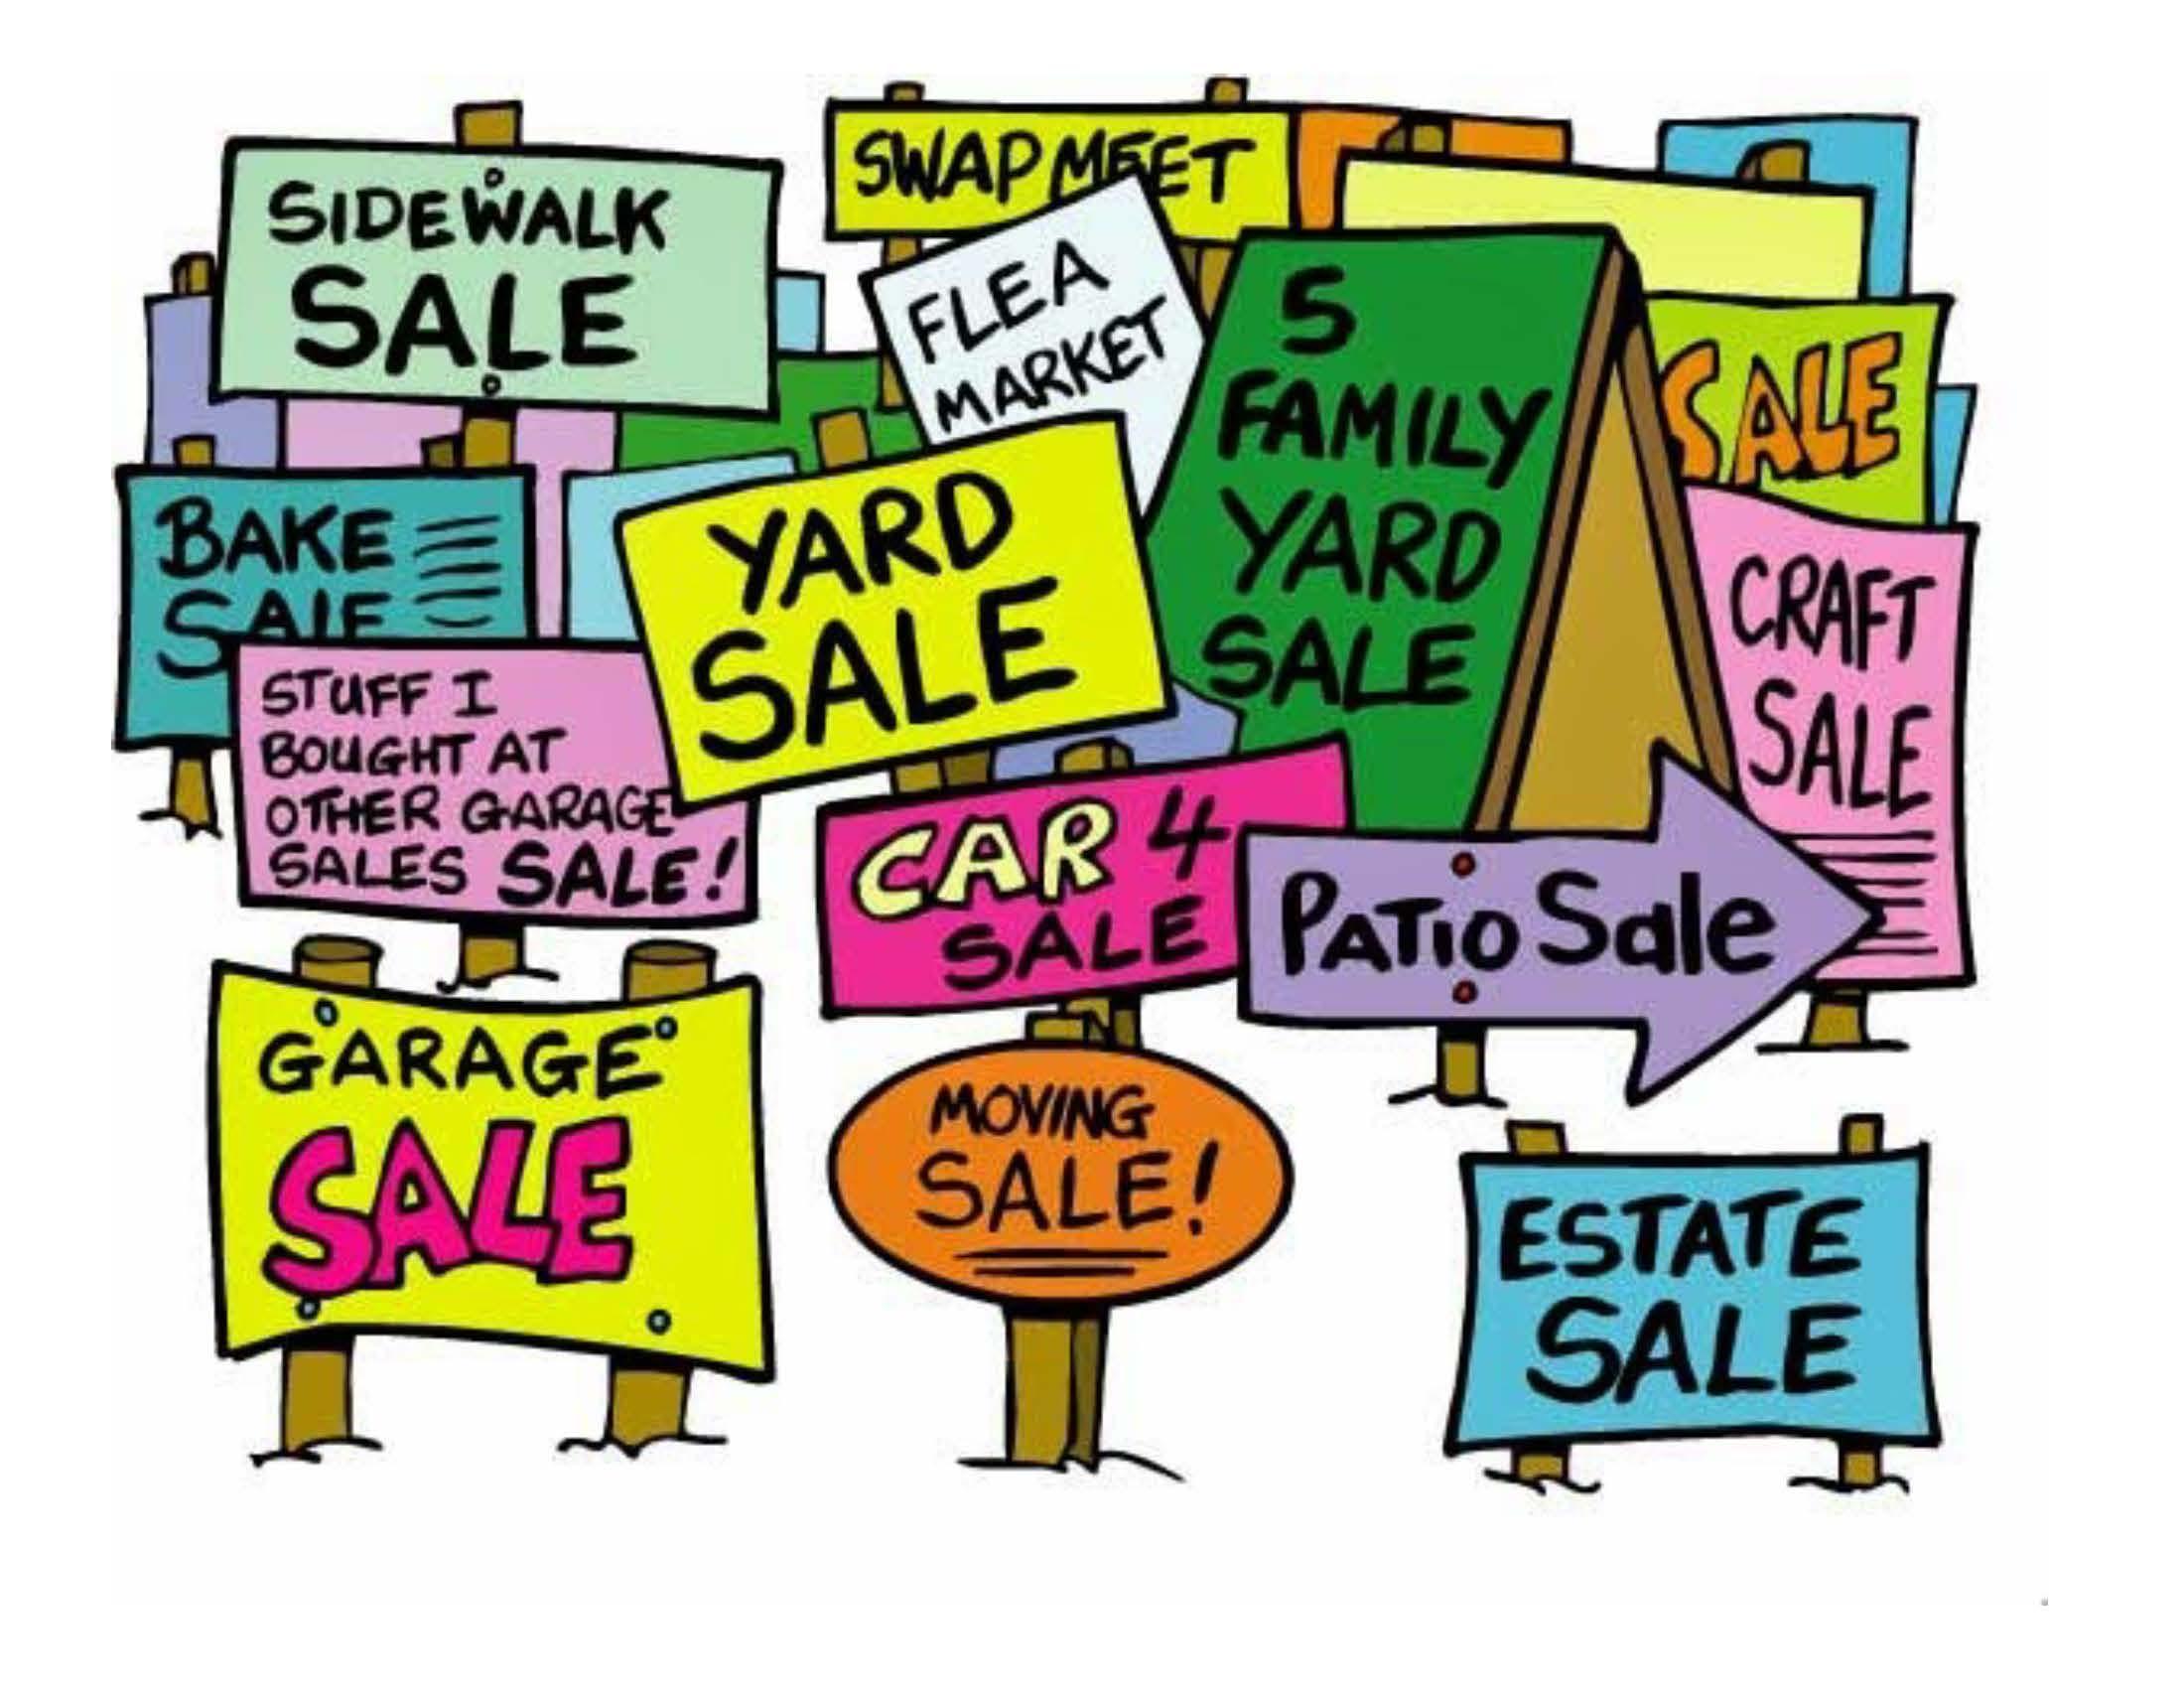 2200x1700 Citywide Rummage Sales